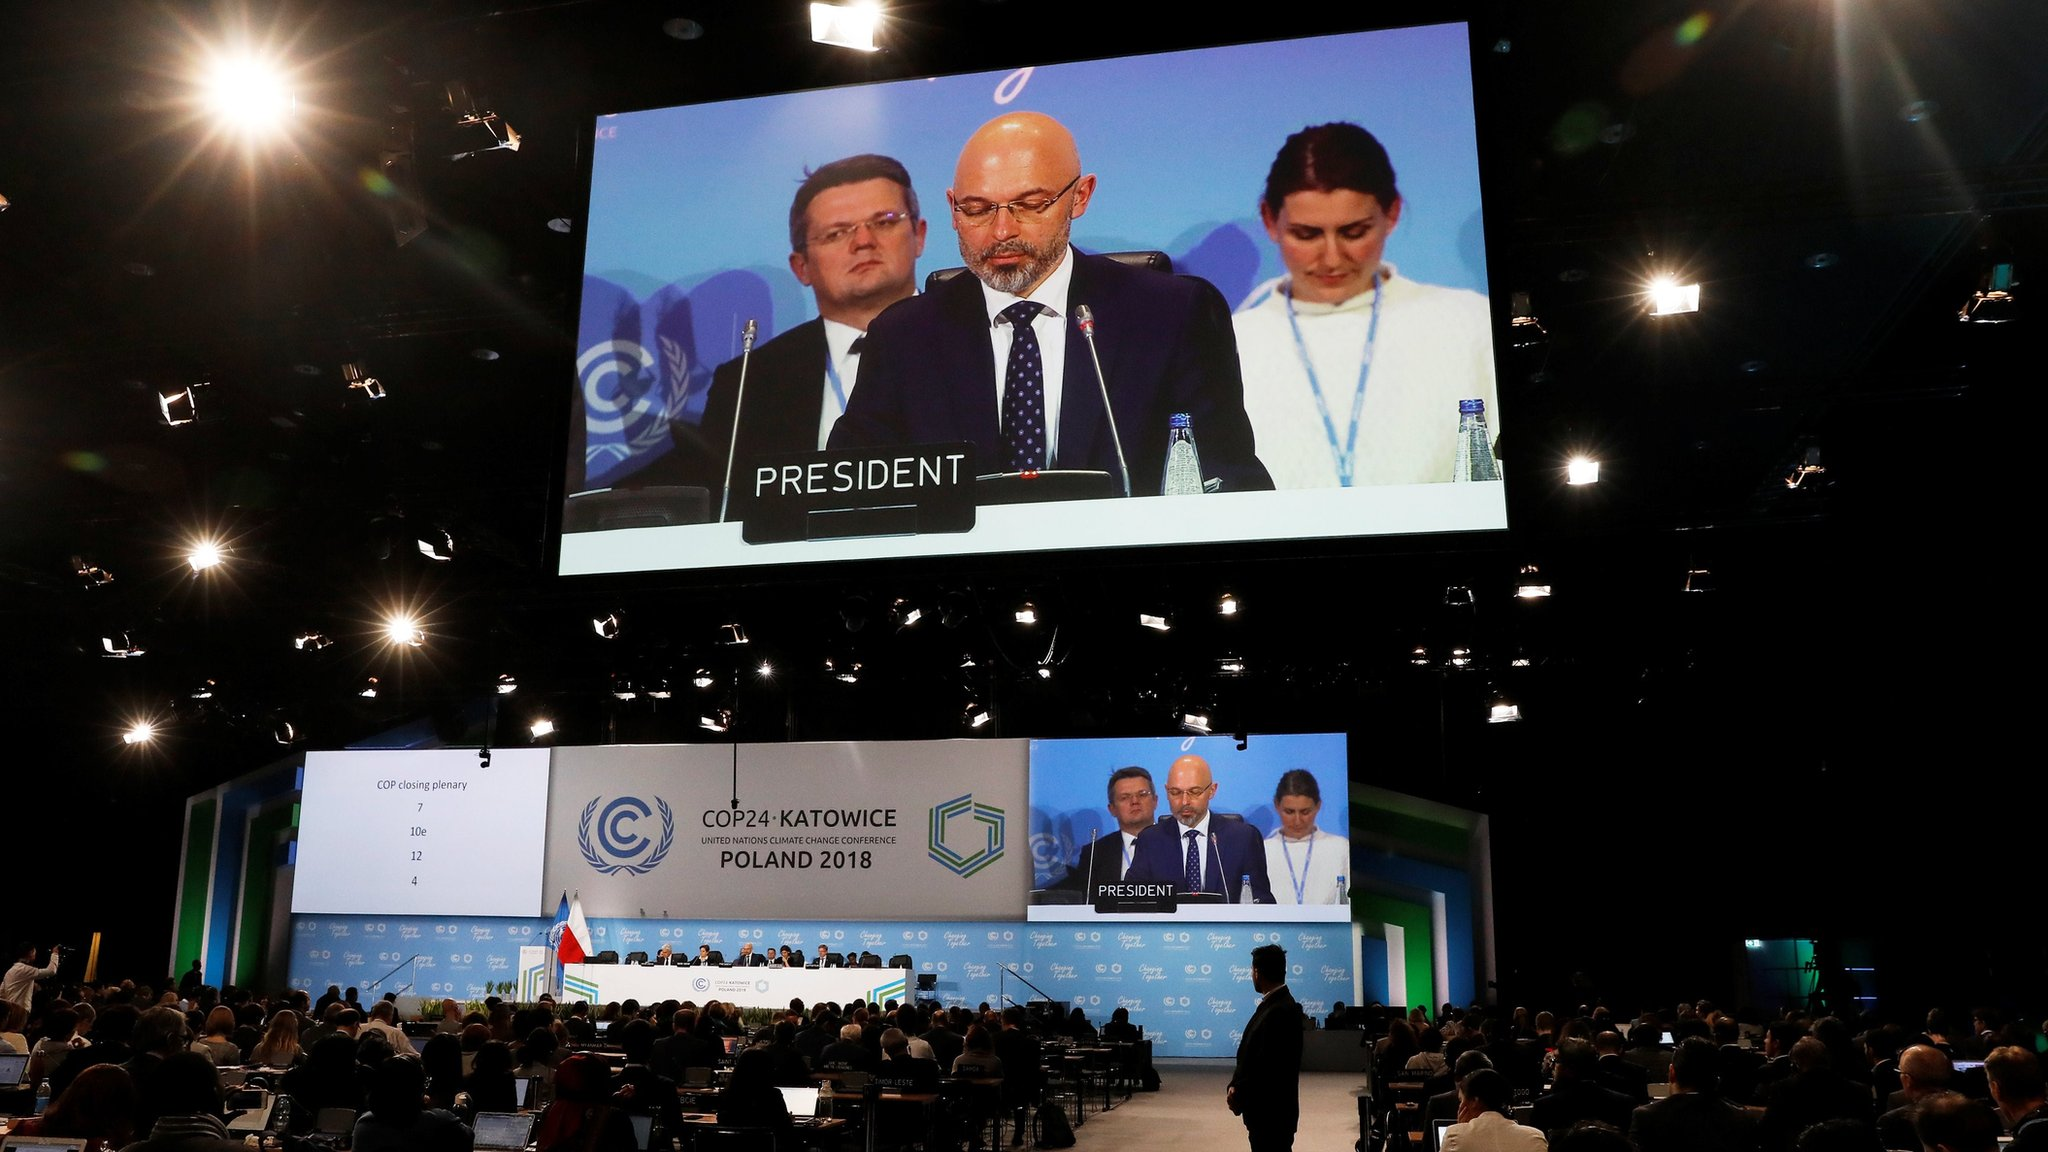 Climate change talks agree details to implement Paris deal